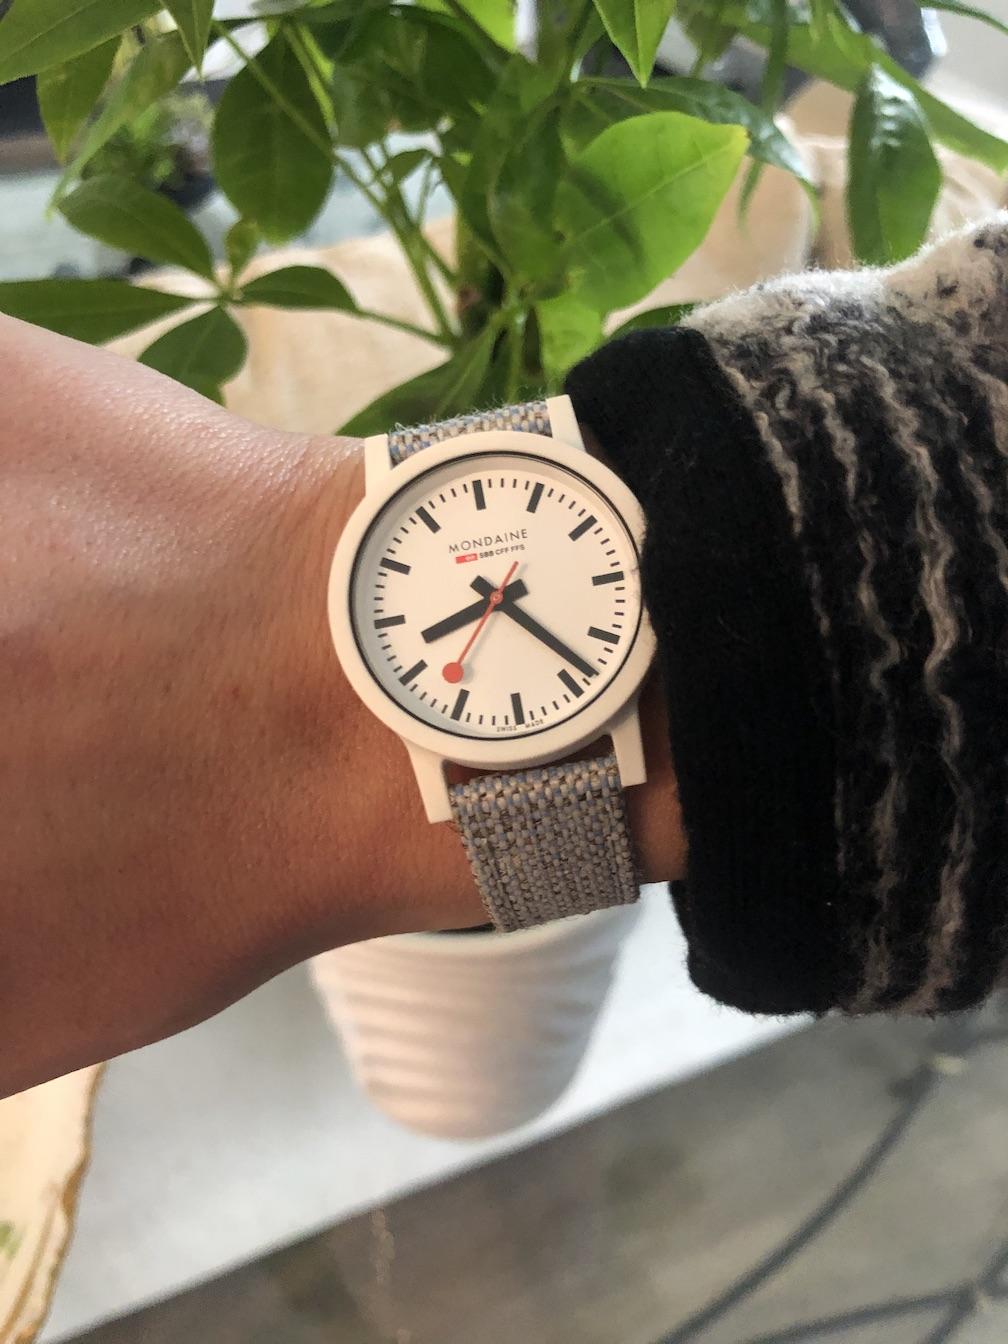 Mondaine sustainable Essence watch